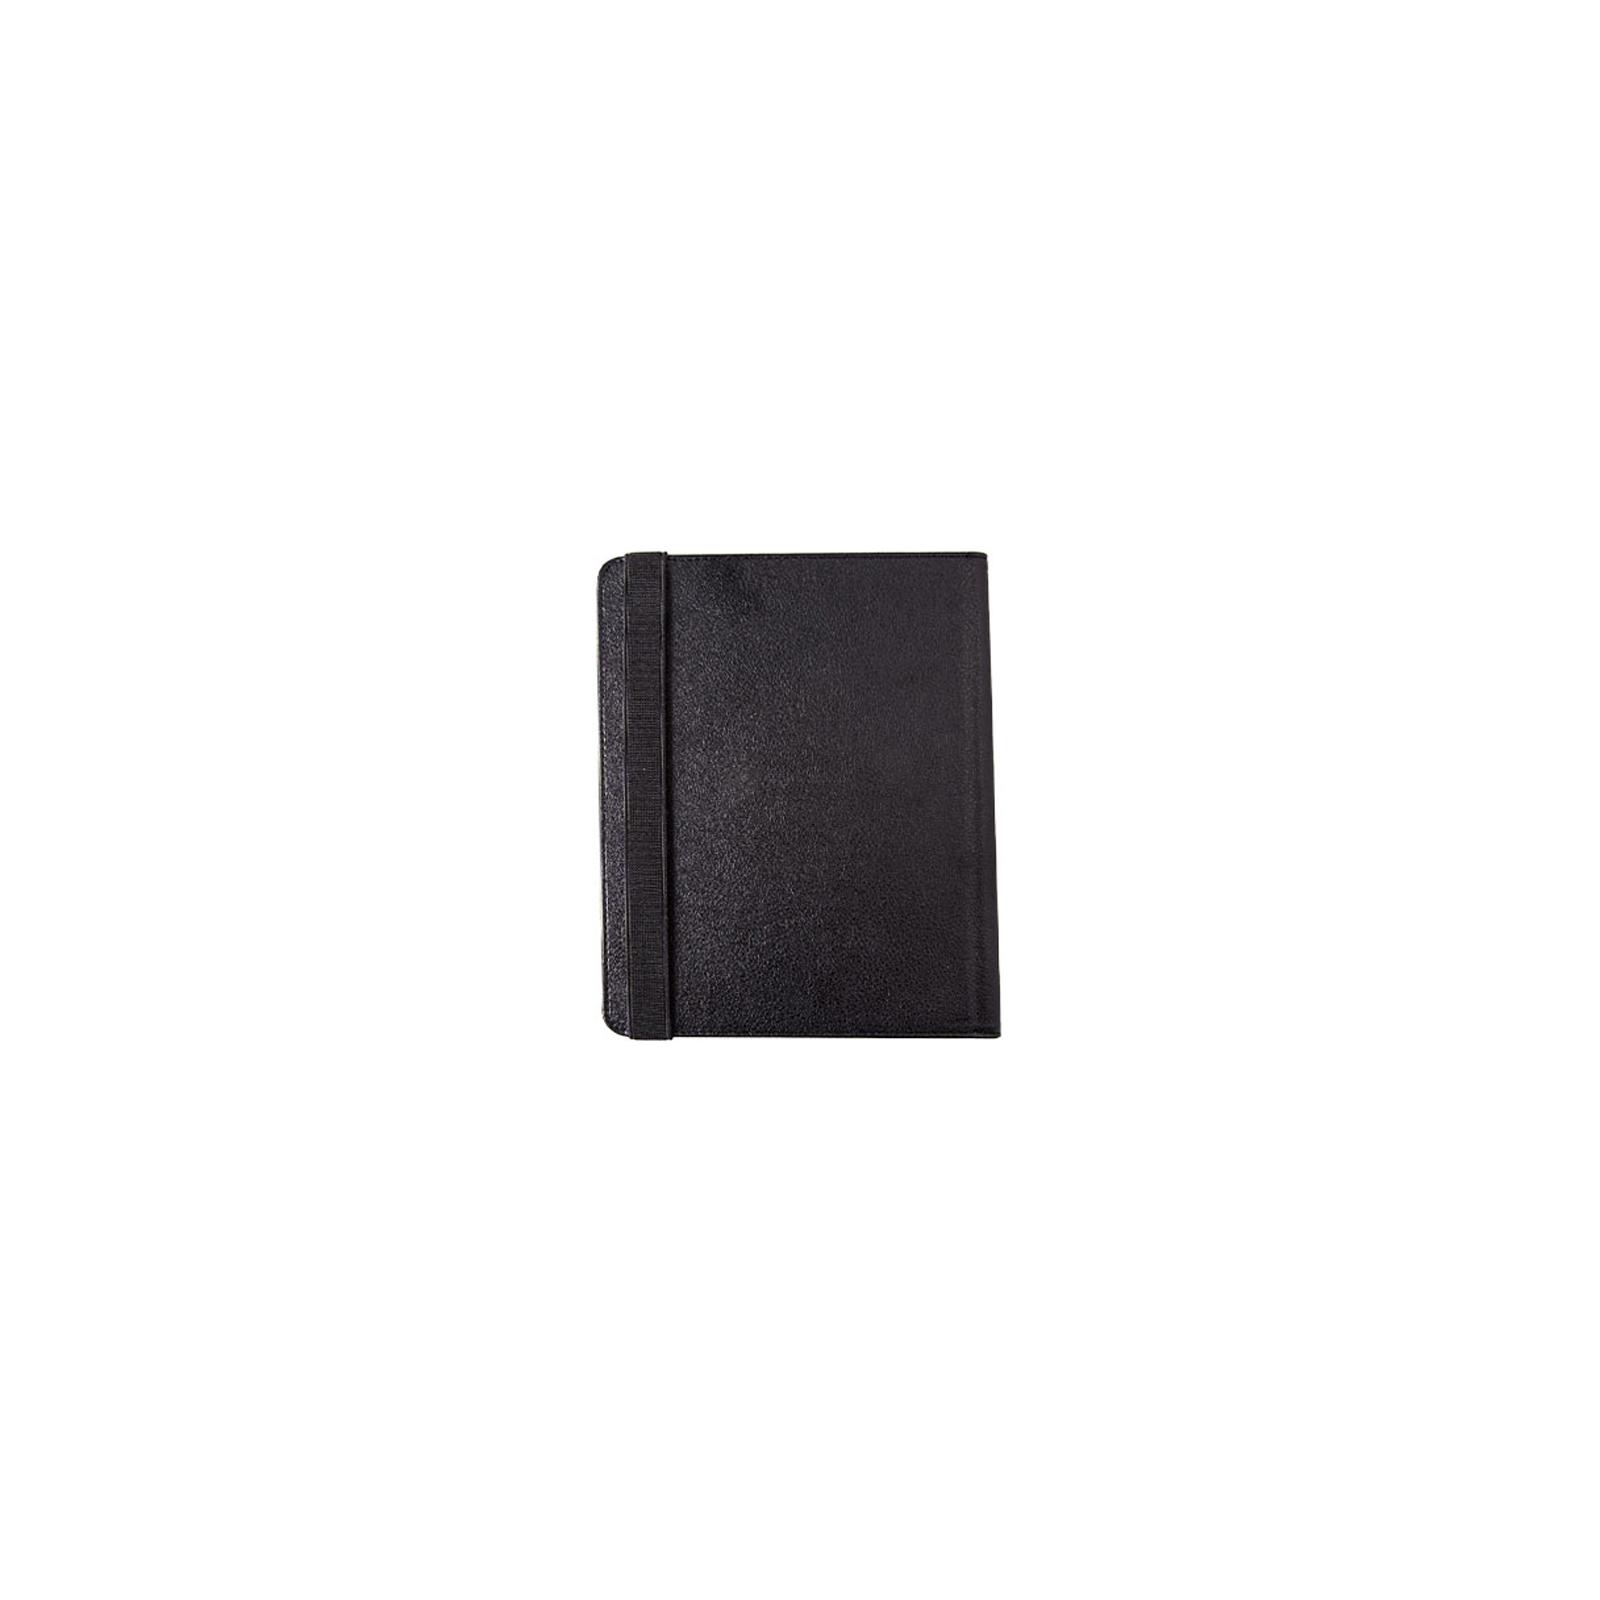 "Чехол для планшета Drobak 8"" Universal stand Black (216874) изображение 3"